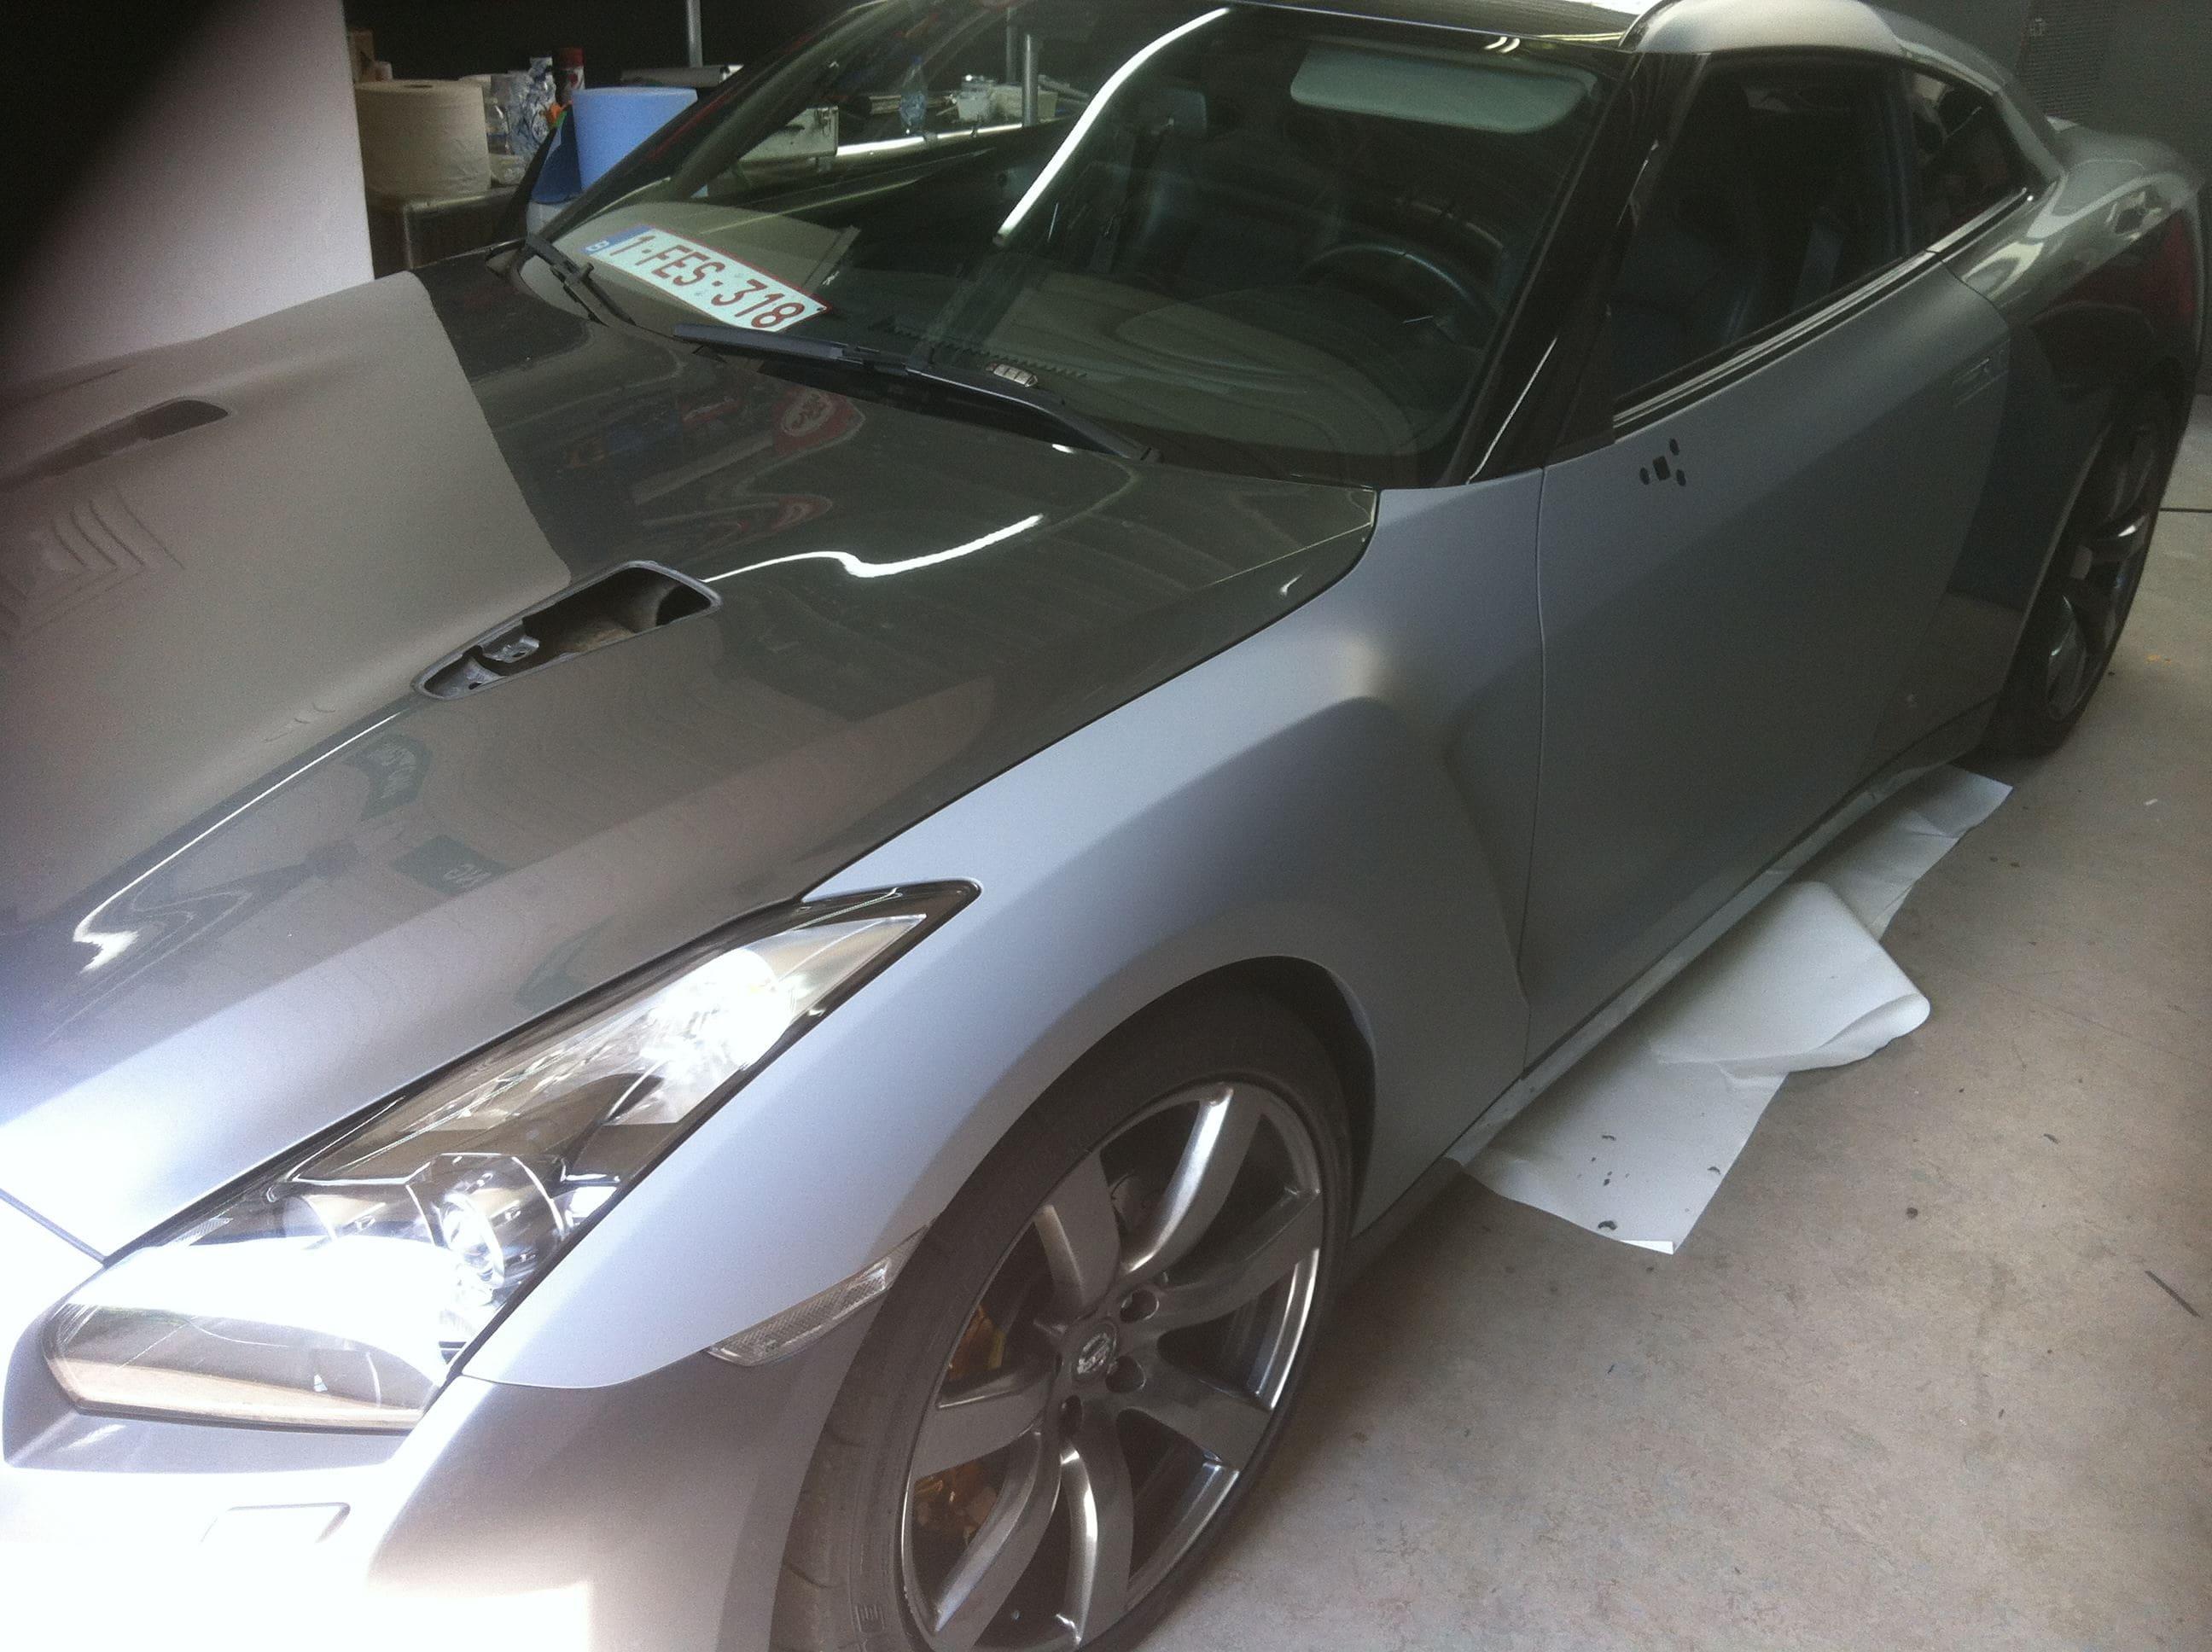 Nissan GT-R met Mat Grijze Wrap, Carwrapping door Wrapmyride.nu Foto-nr:6545, ©2021